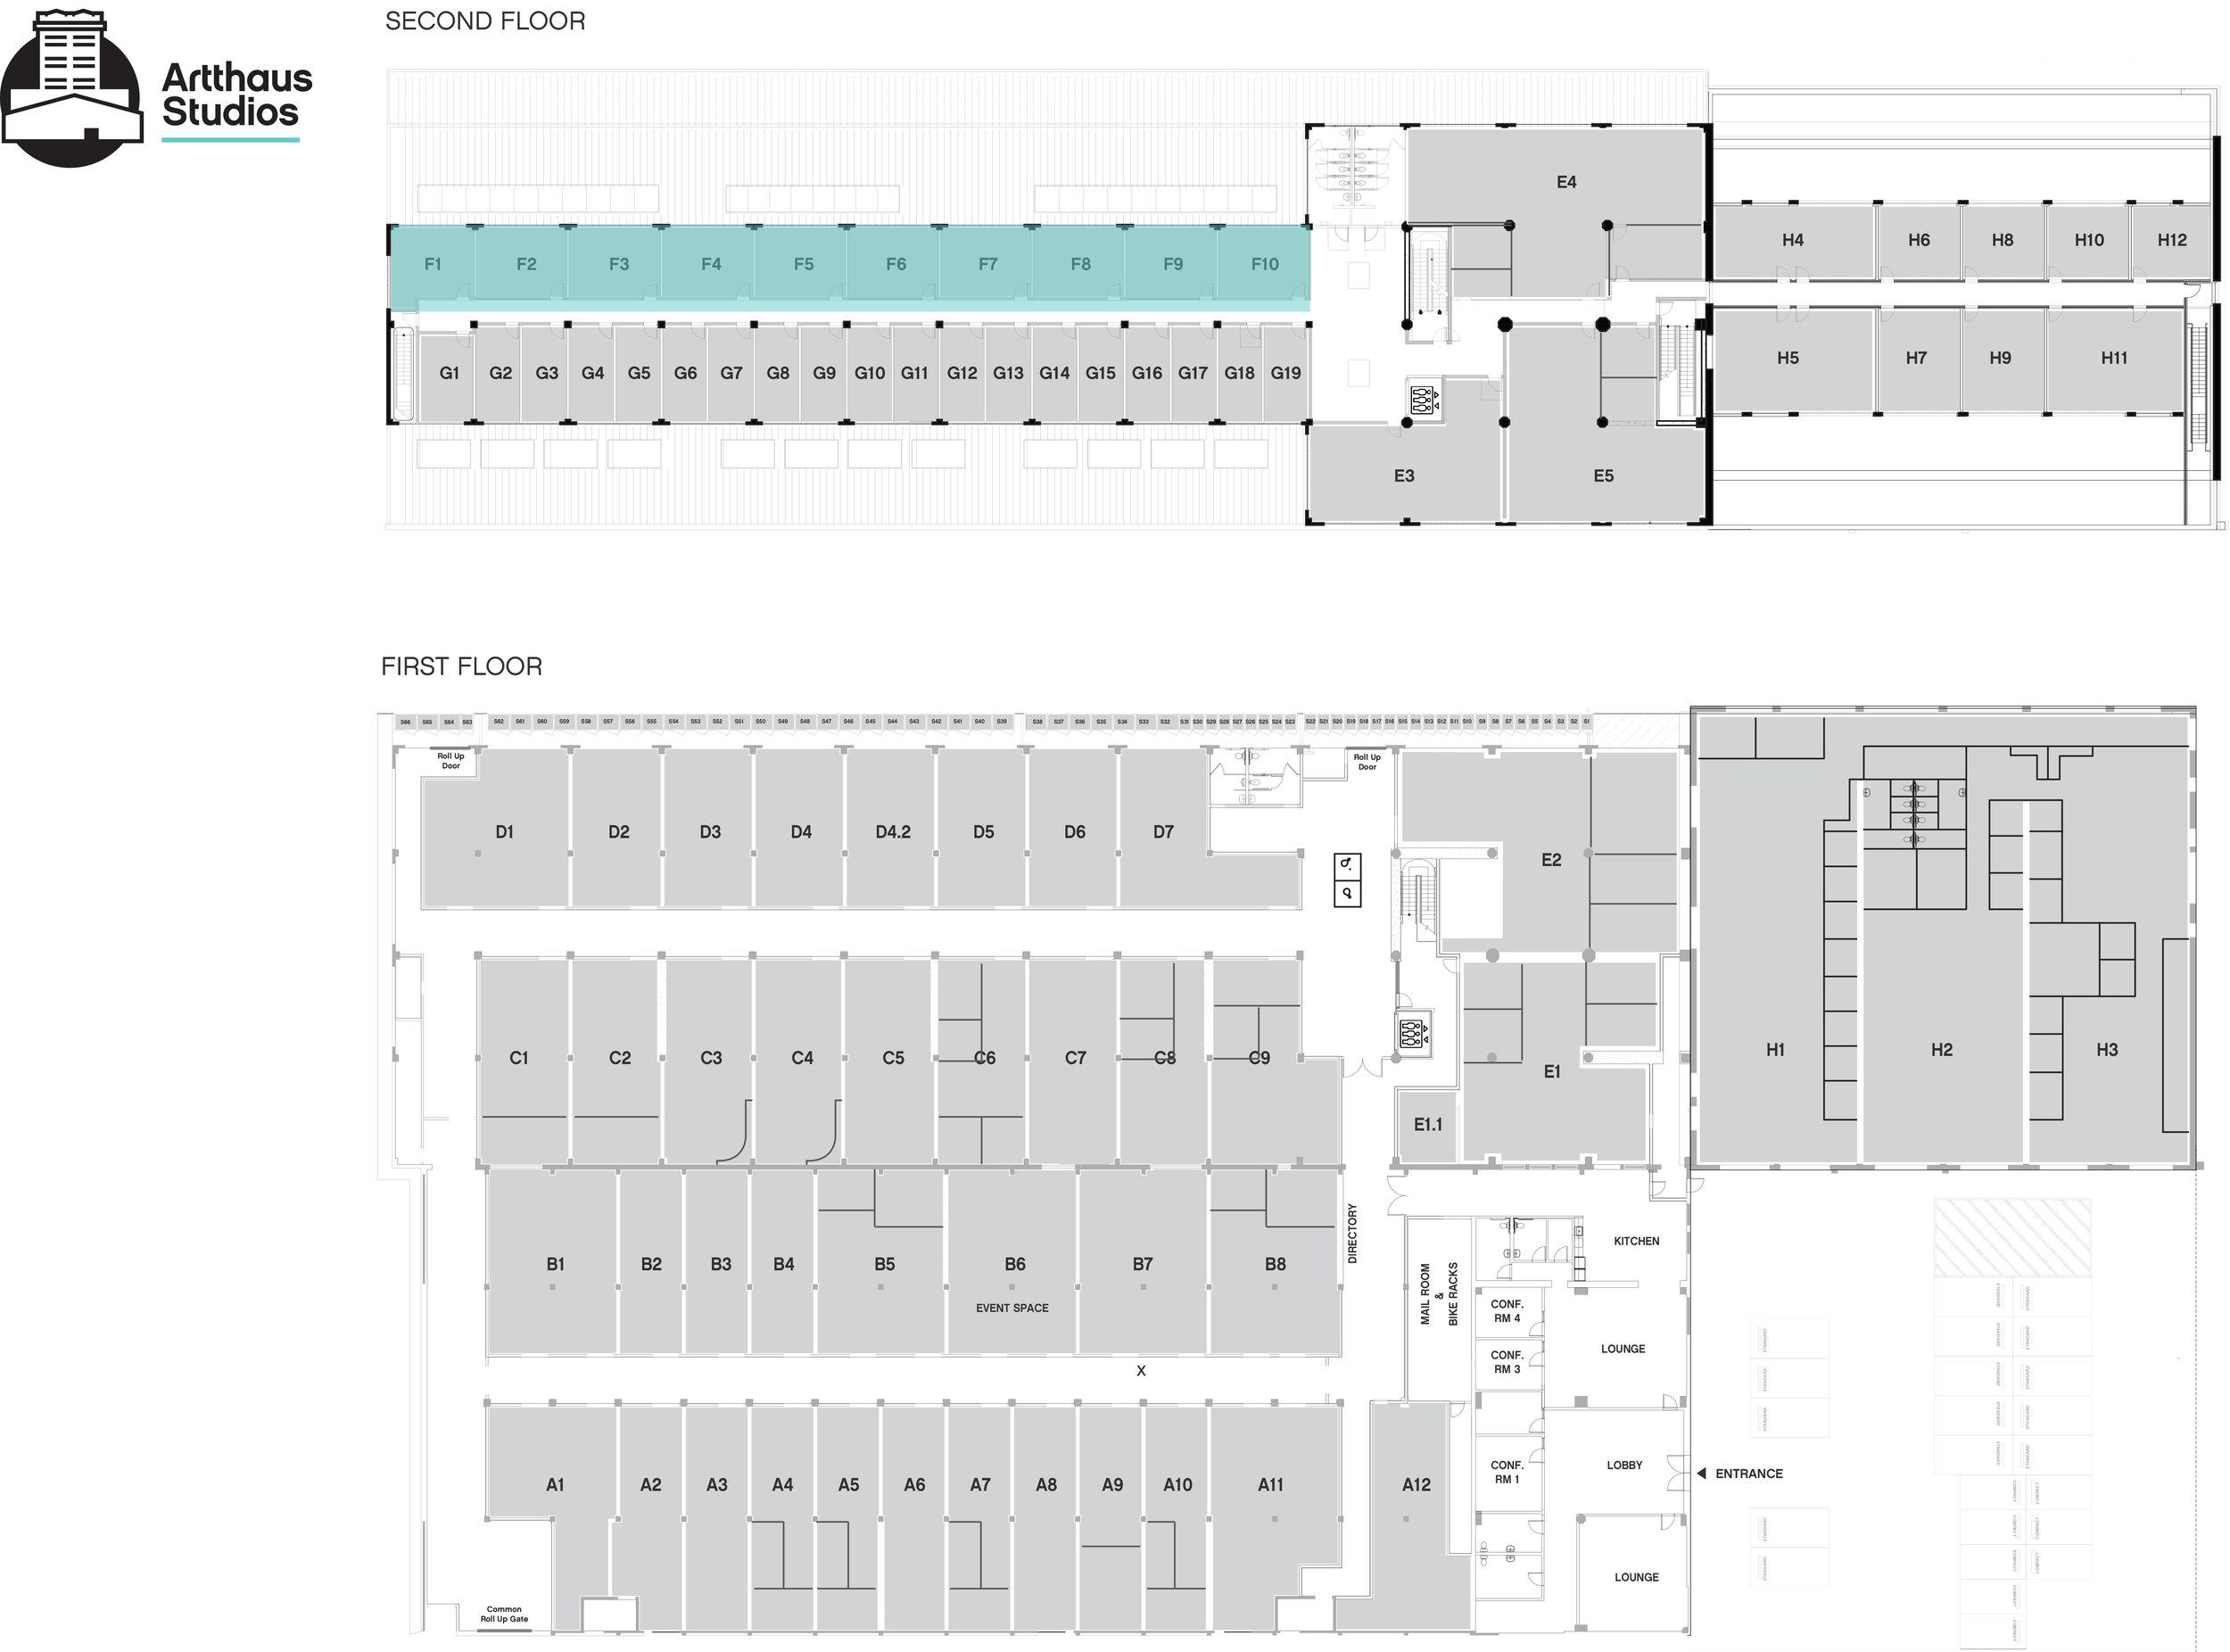 Artthaus Studios_Map_Fspaces.jpg